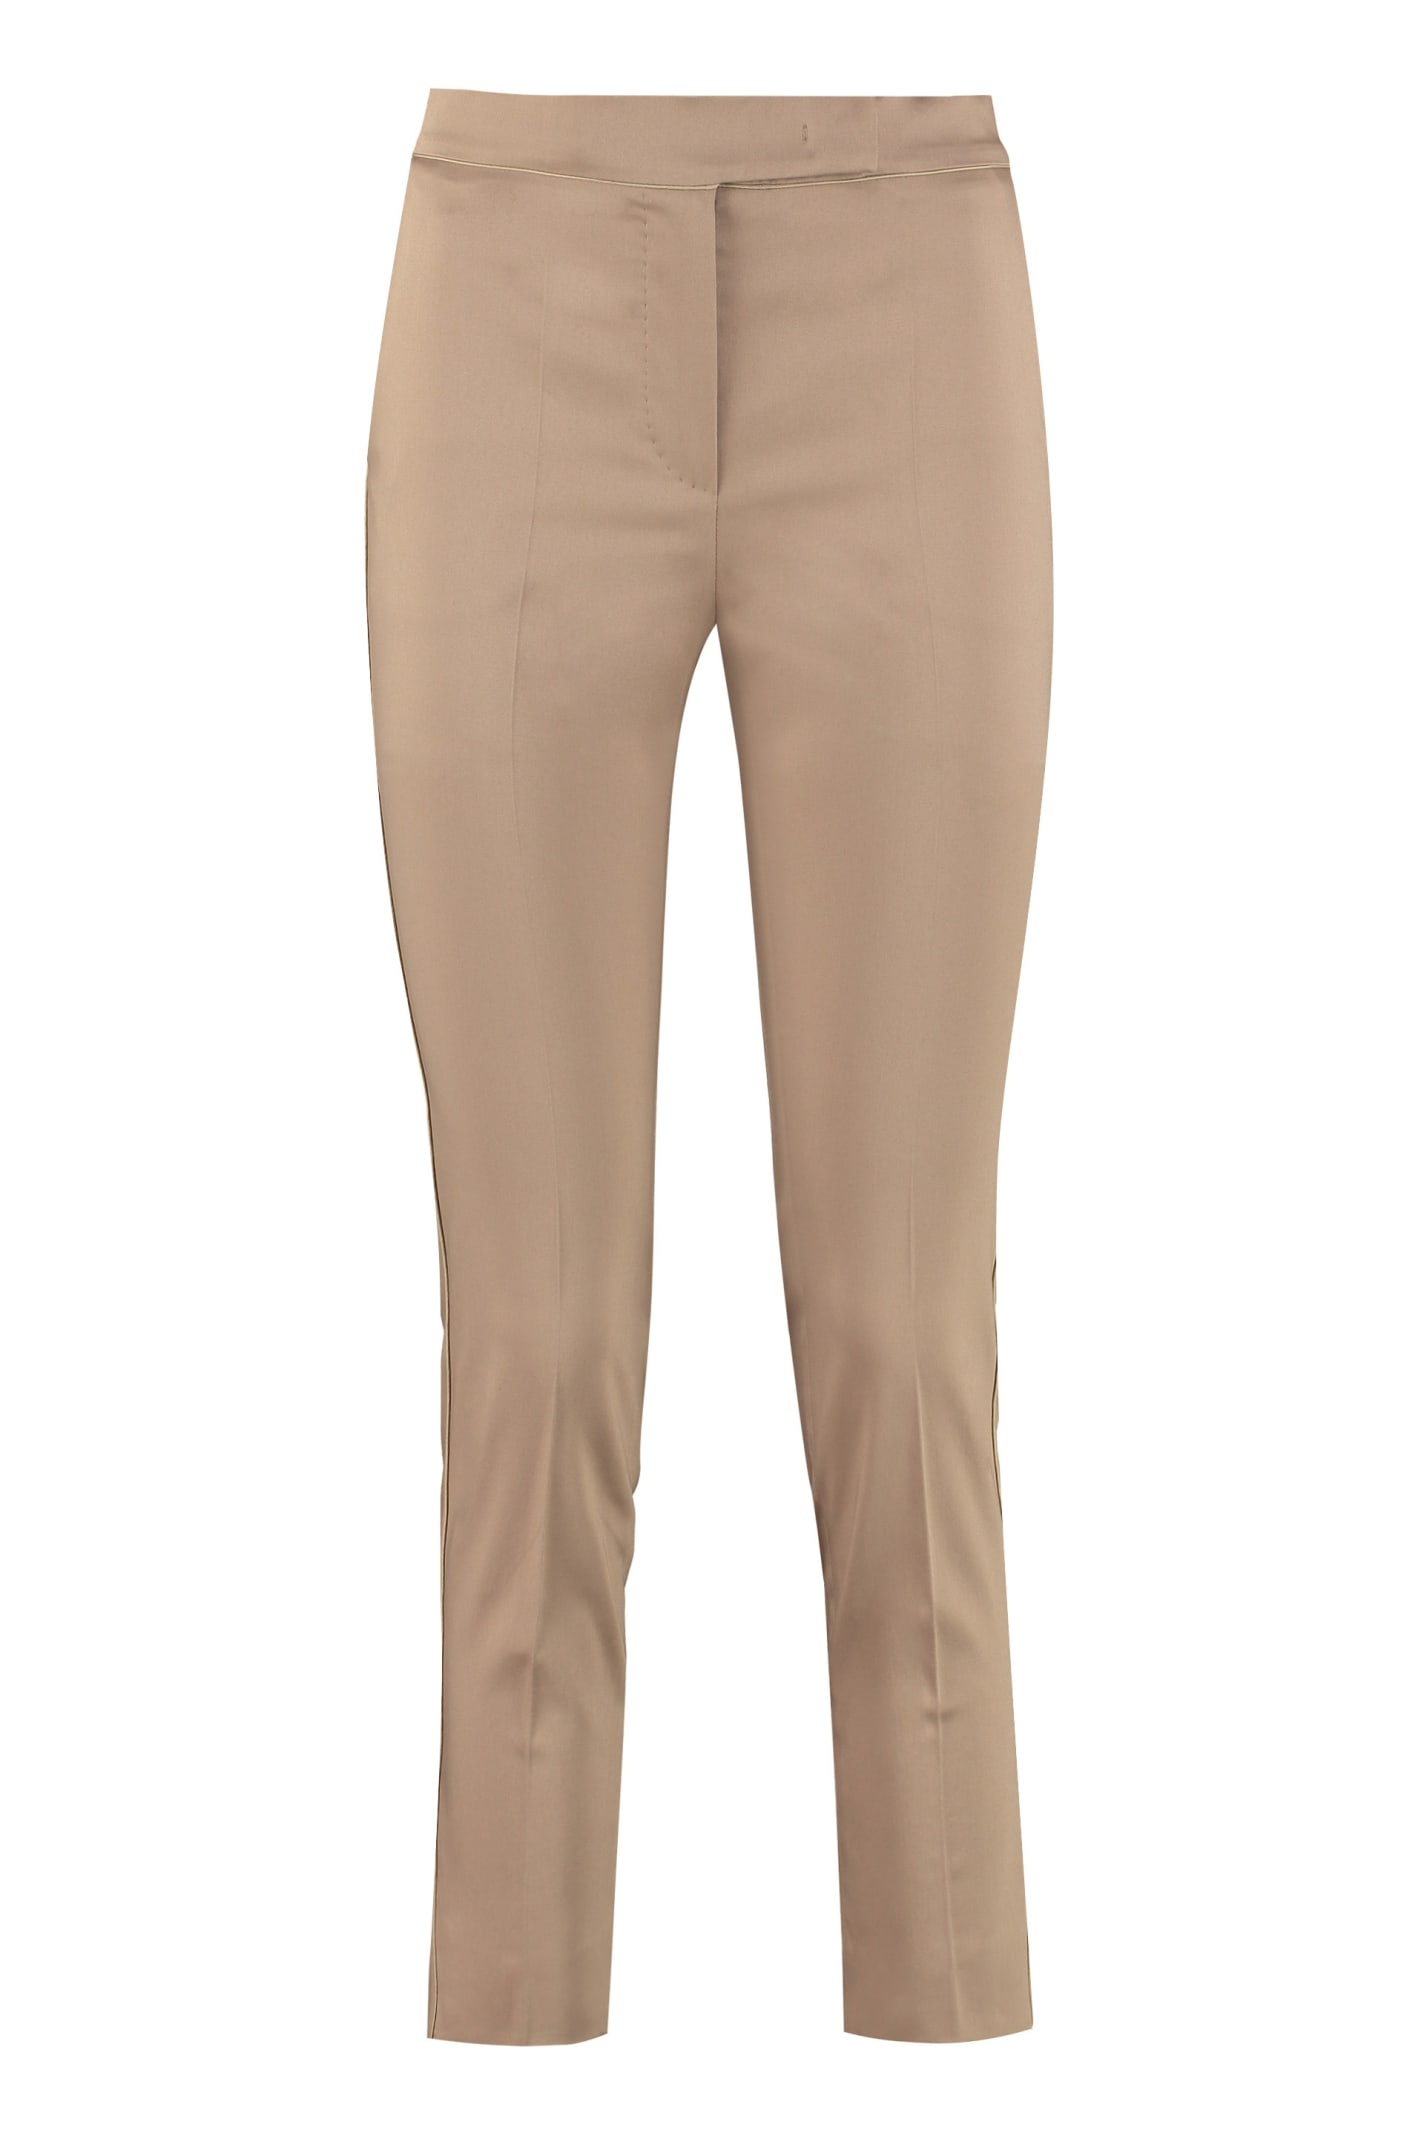 Max Mara Luana Stretch Cotton Trousers